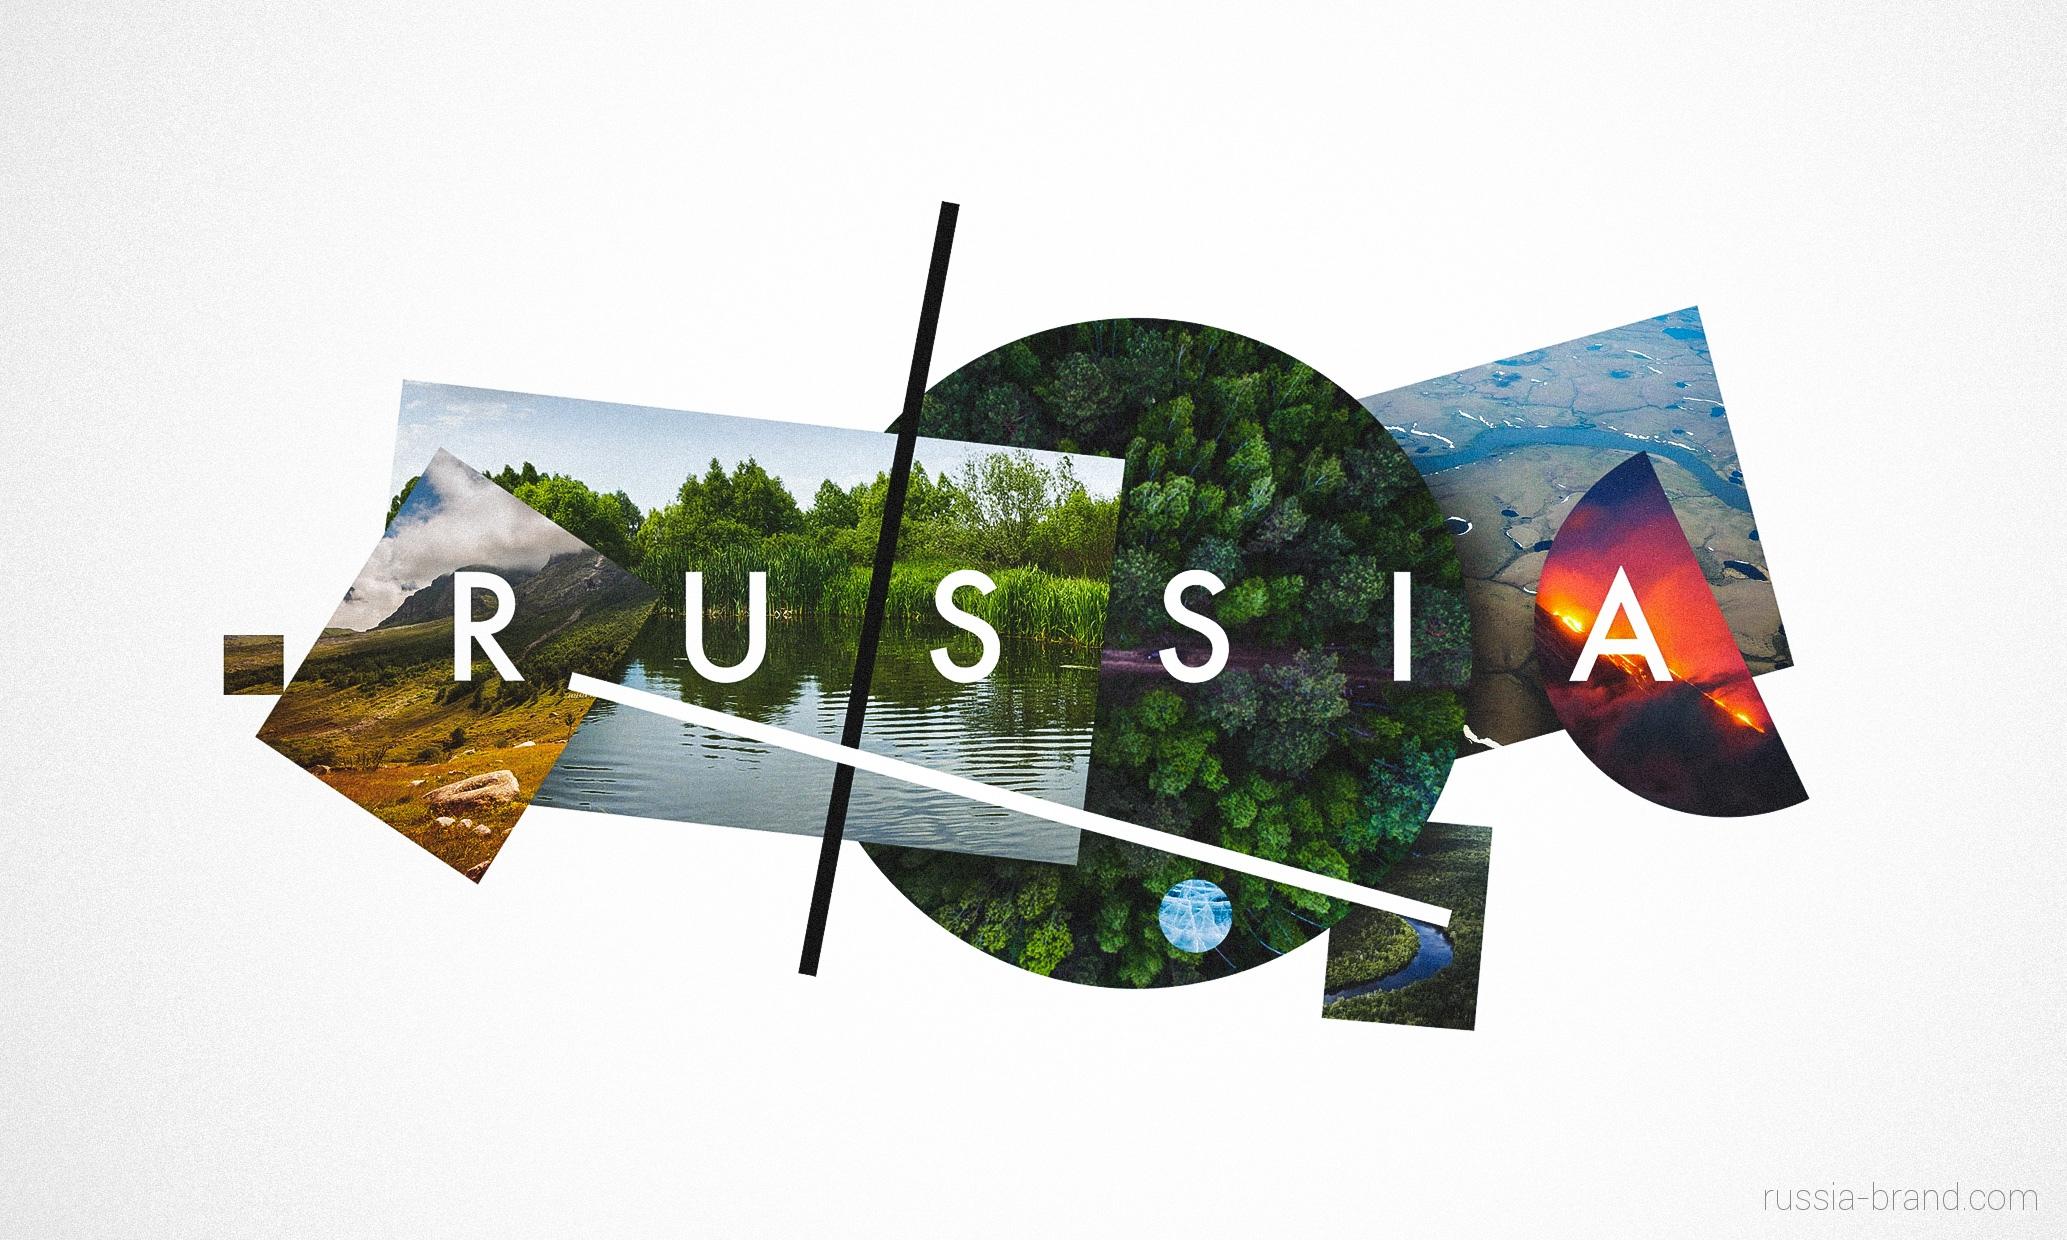 russia-brand3.jpg